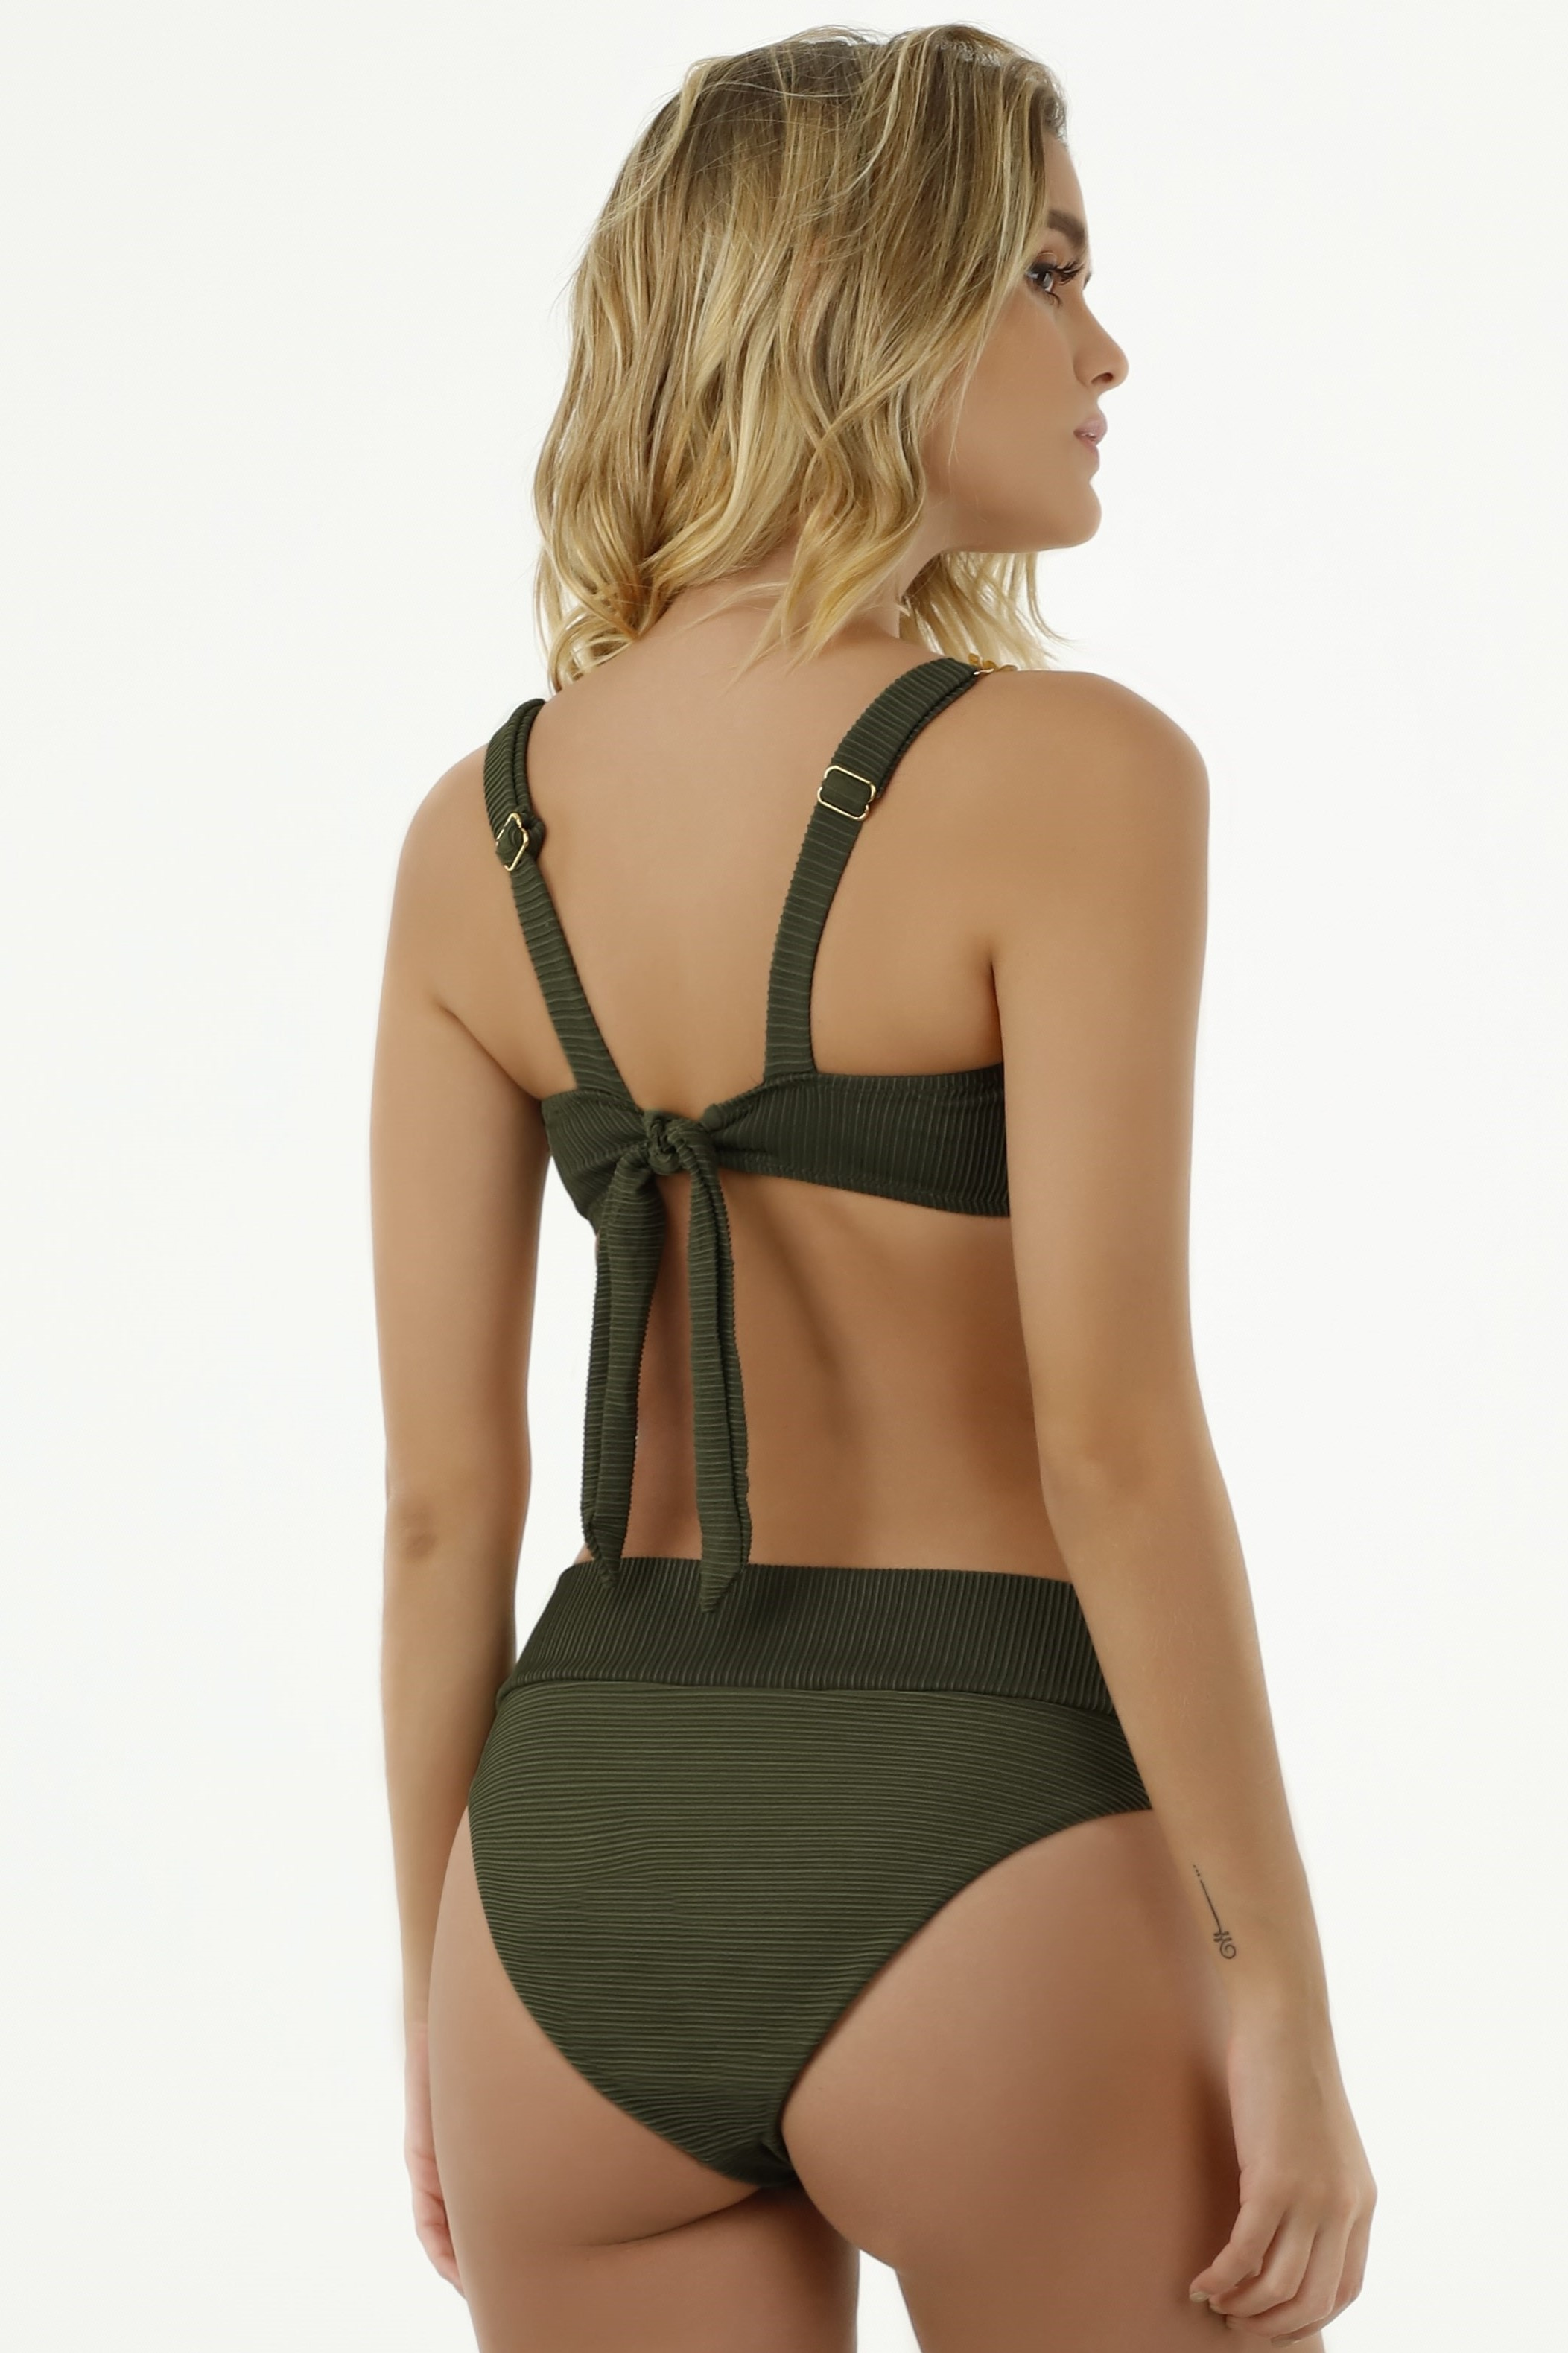 Milonga Texture High Waisted Bikini Green